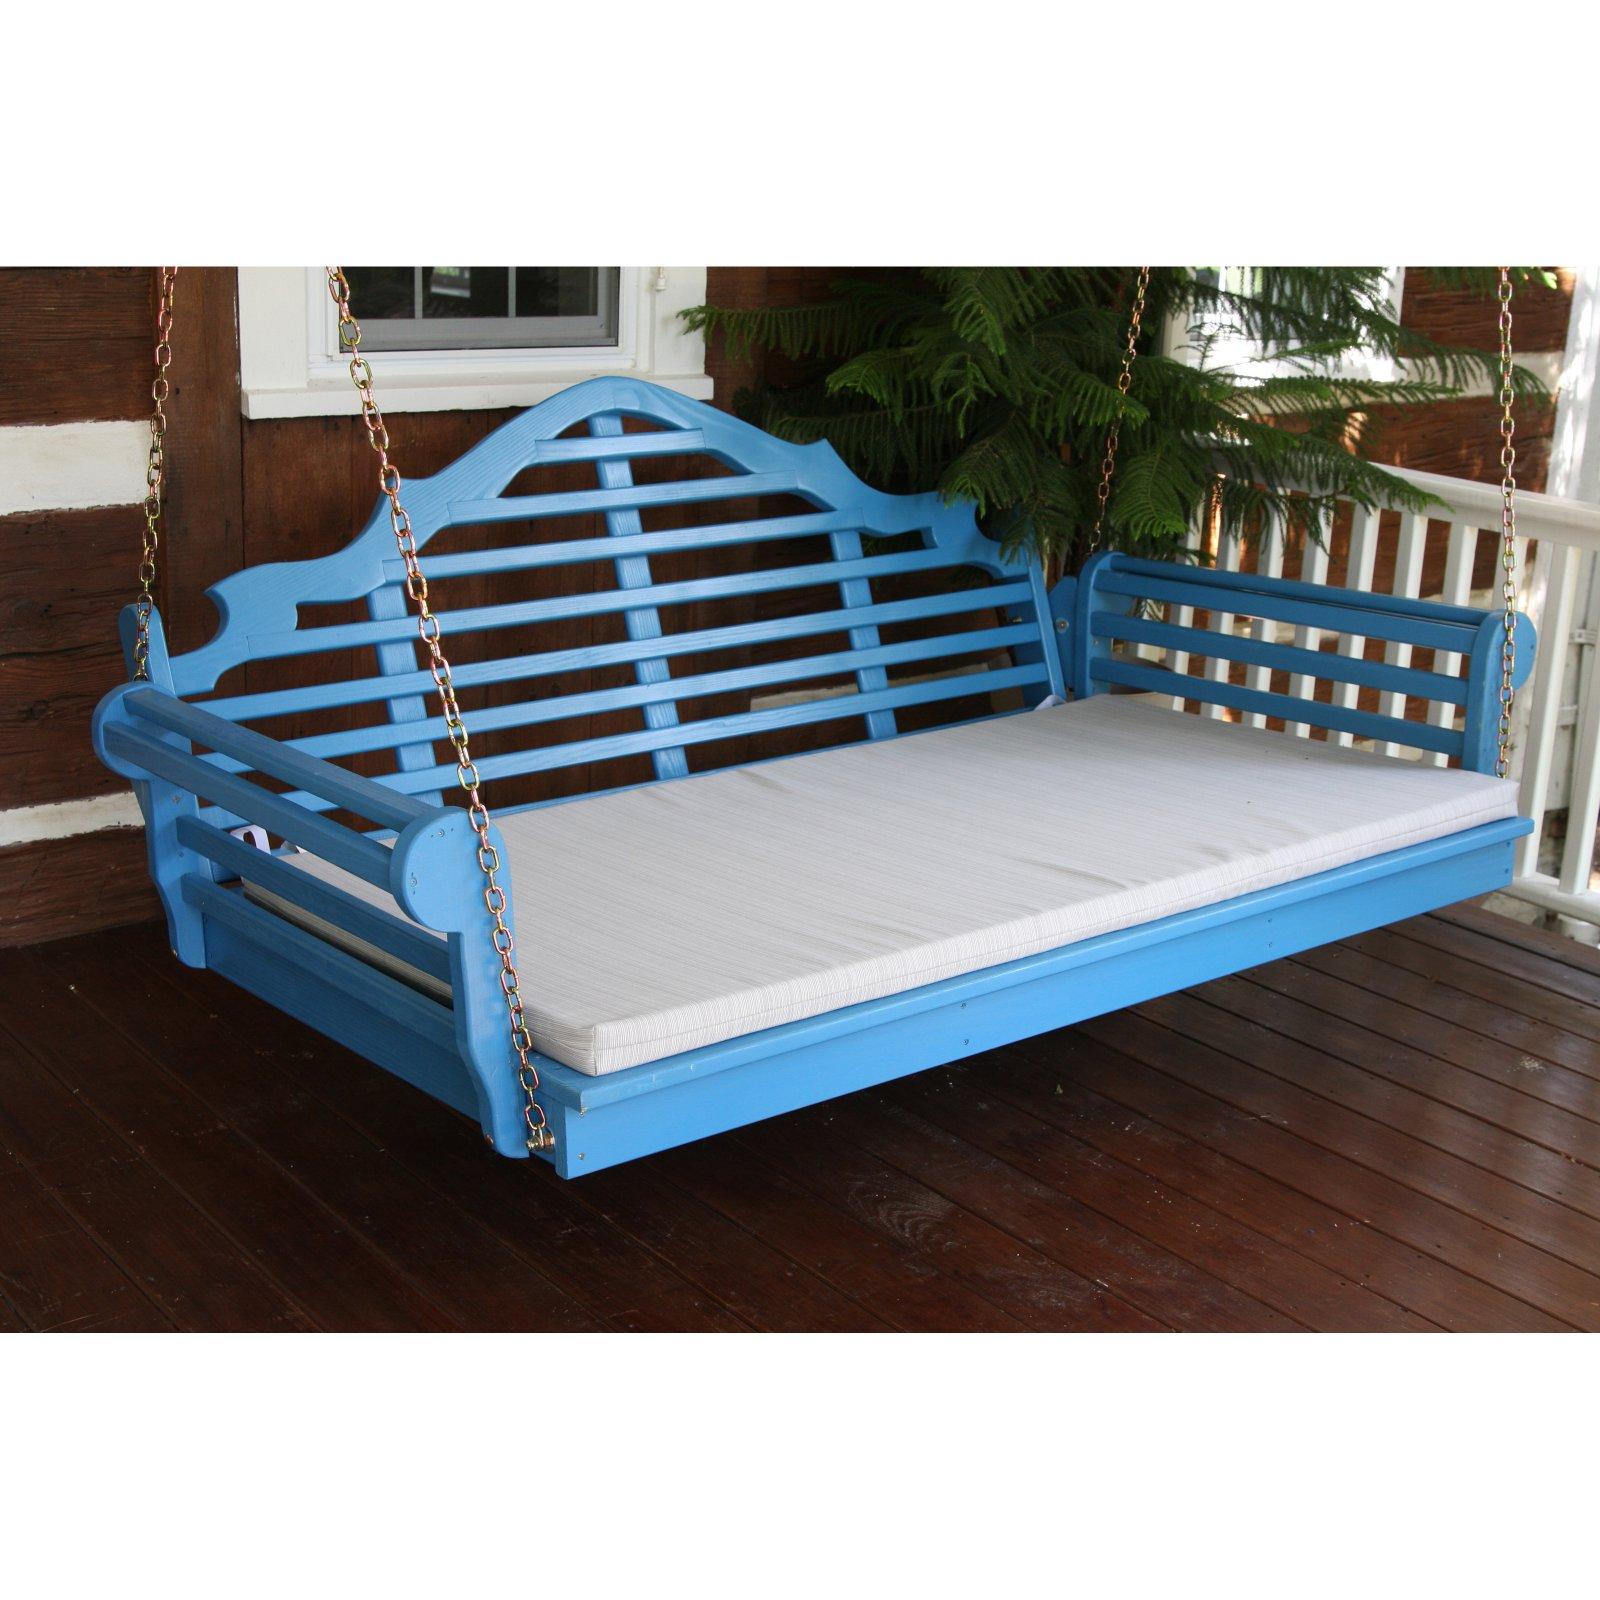 A & L Furniture Yellow Pine Marlboro Swing Bed